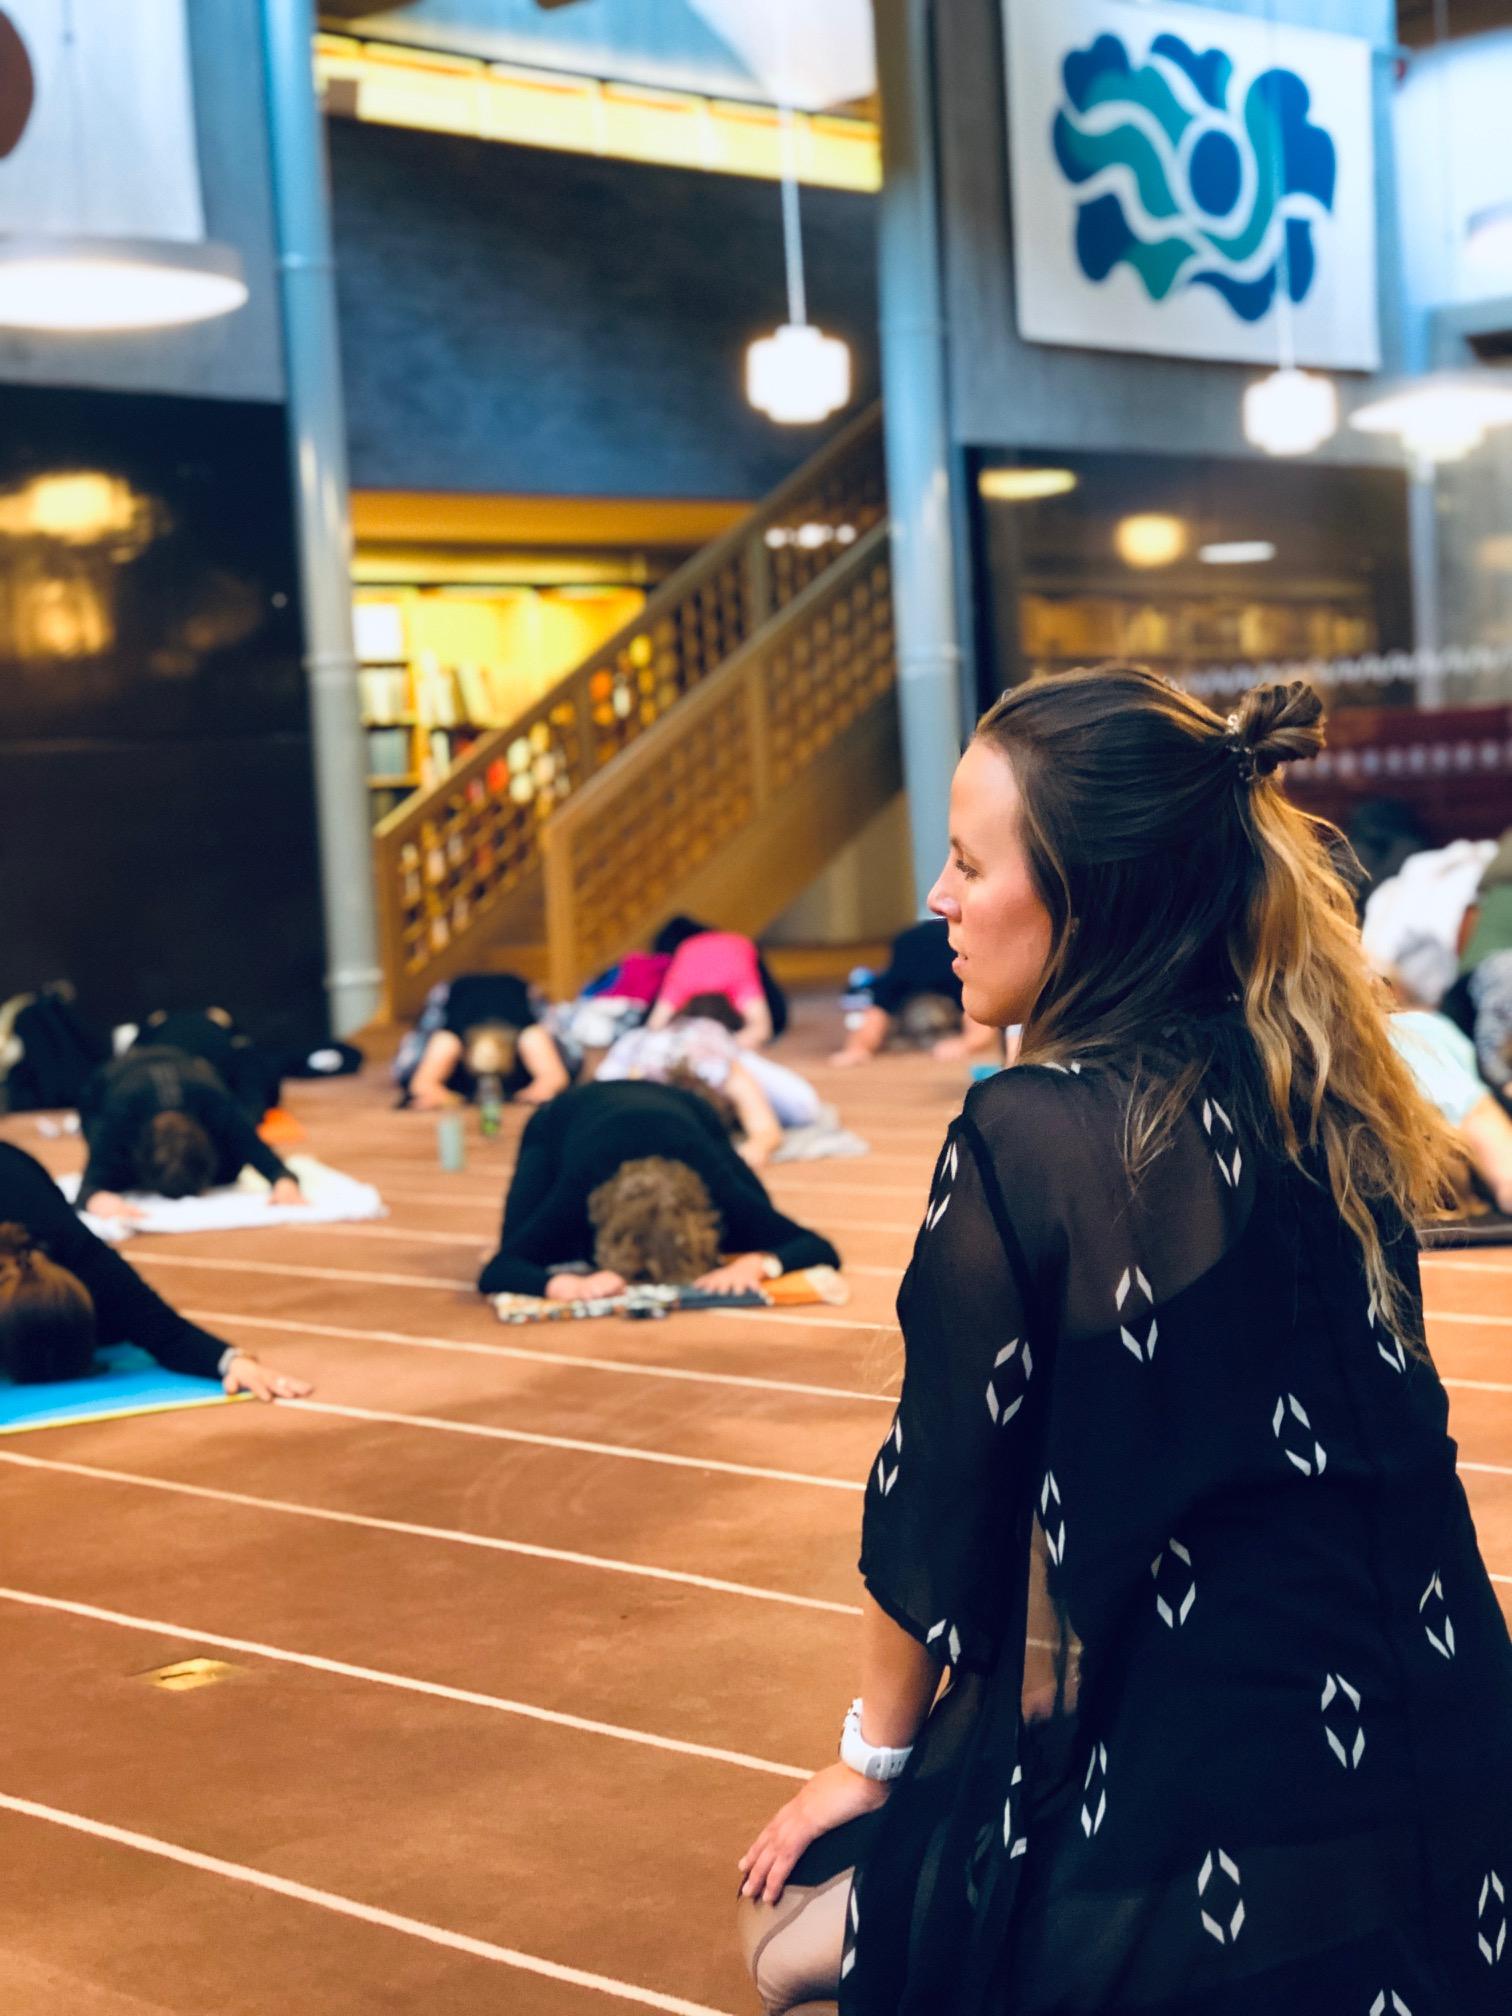 Yogainstruktören Josefin framför sin klass. Yogainstructor Josefin in front of her class